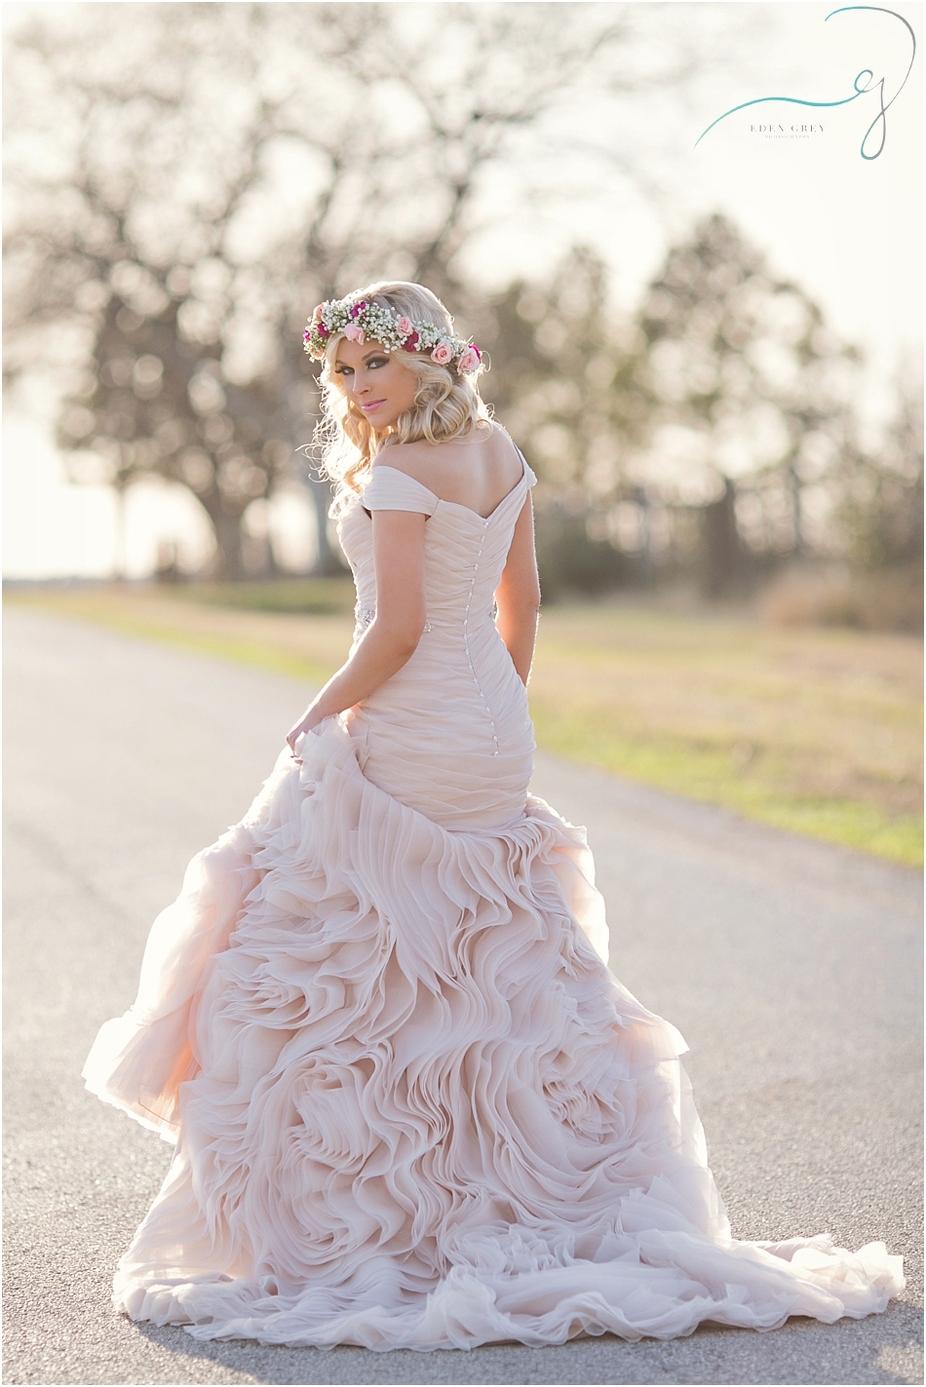 Blush wedding gowns - blush wedding dresses